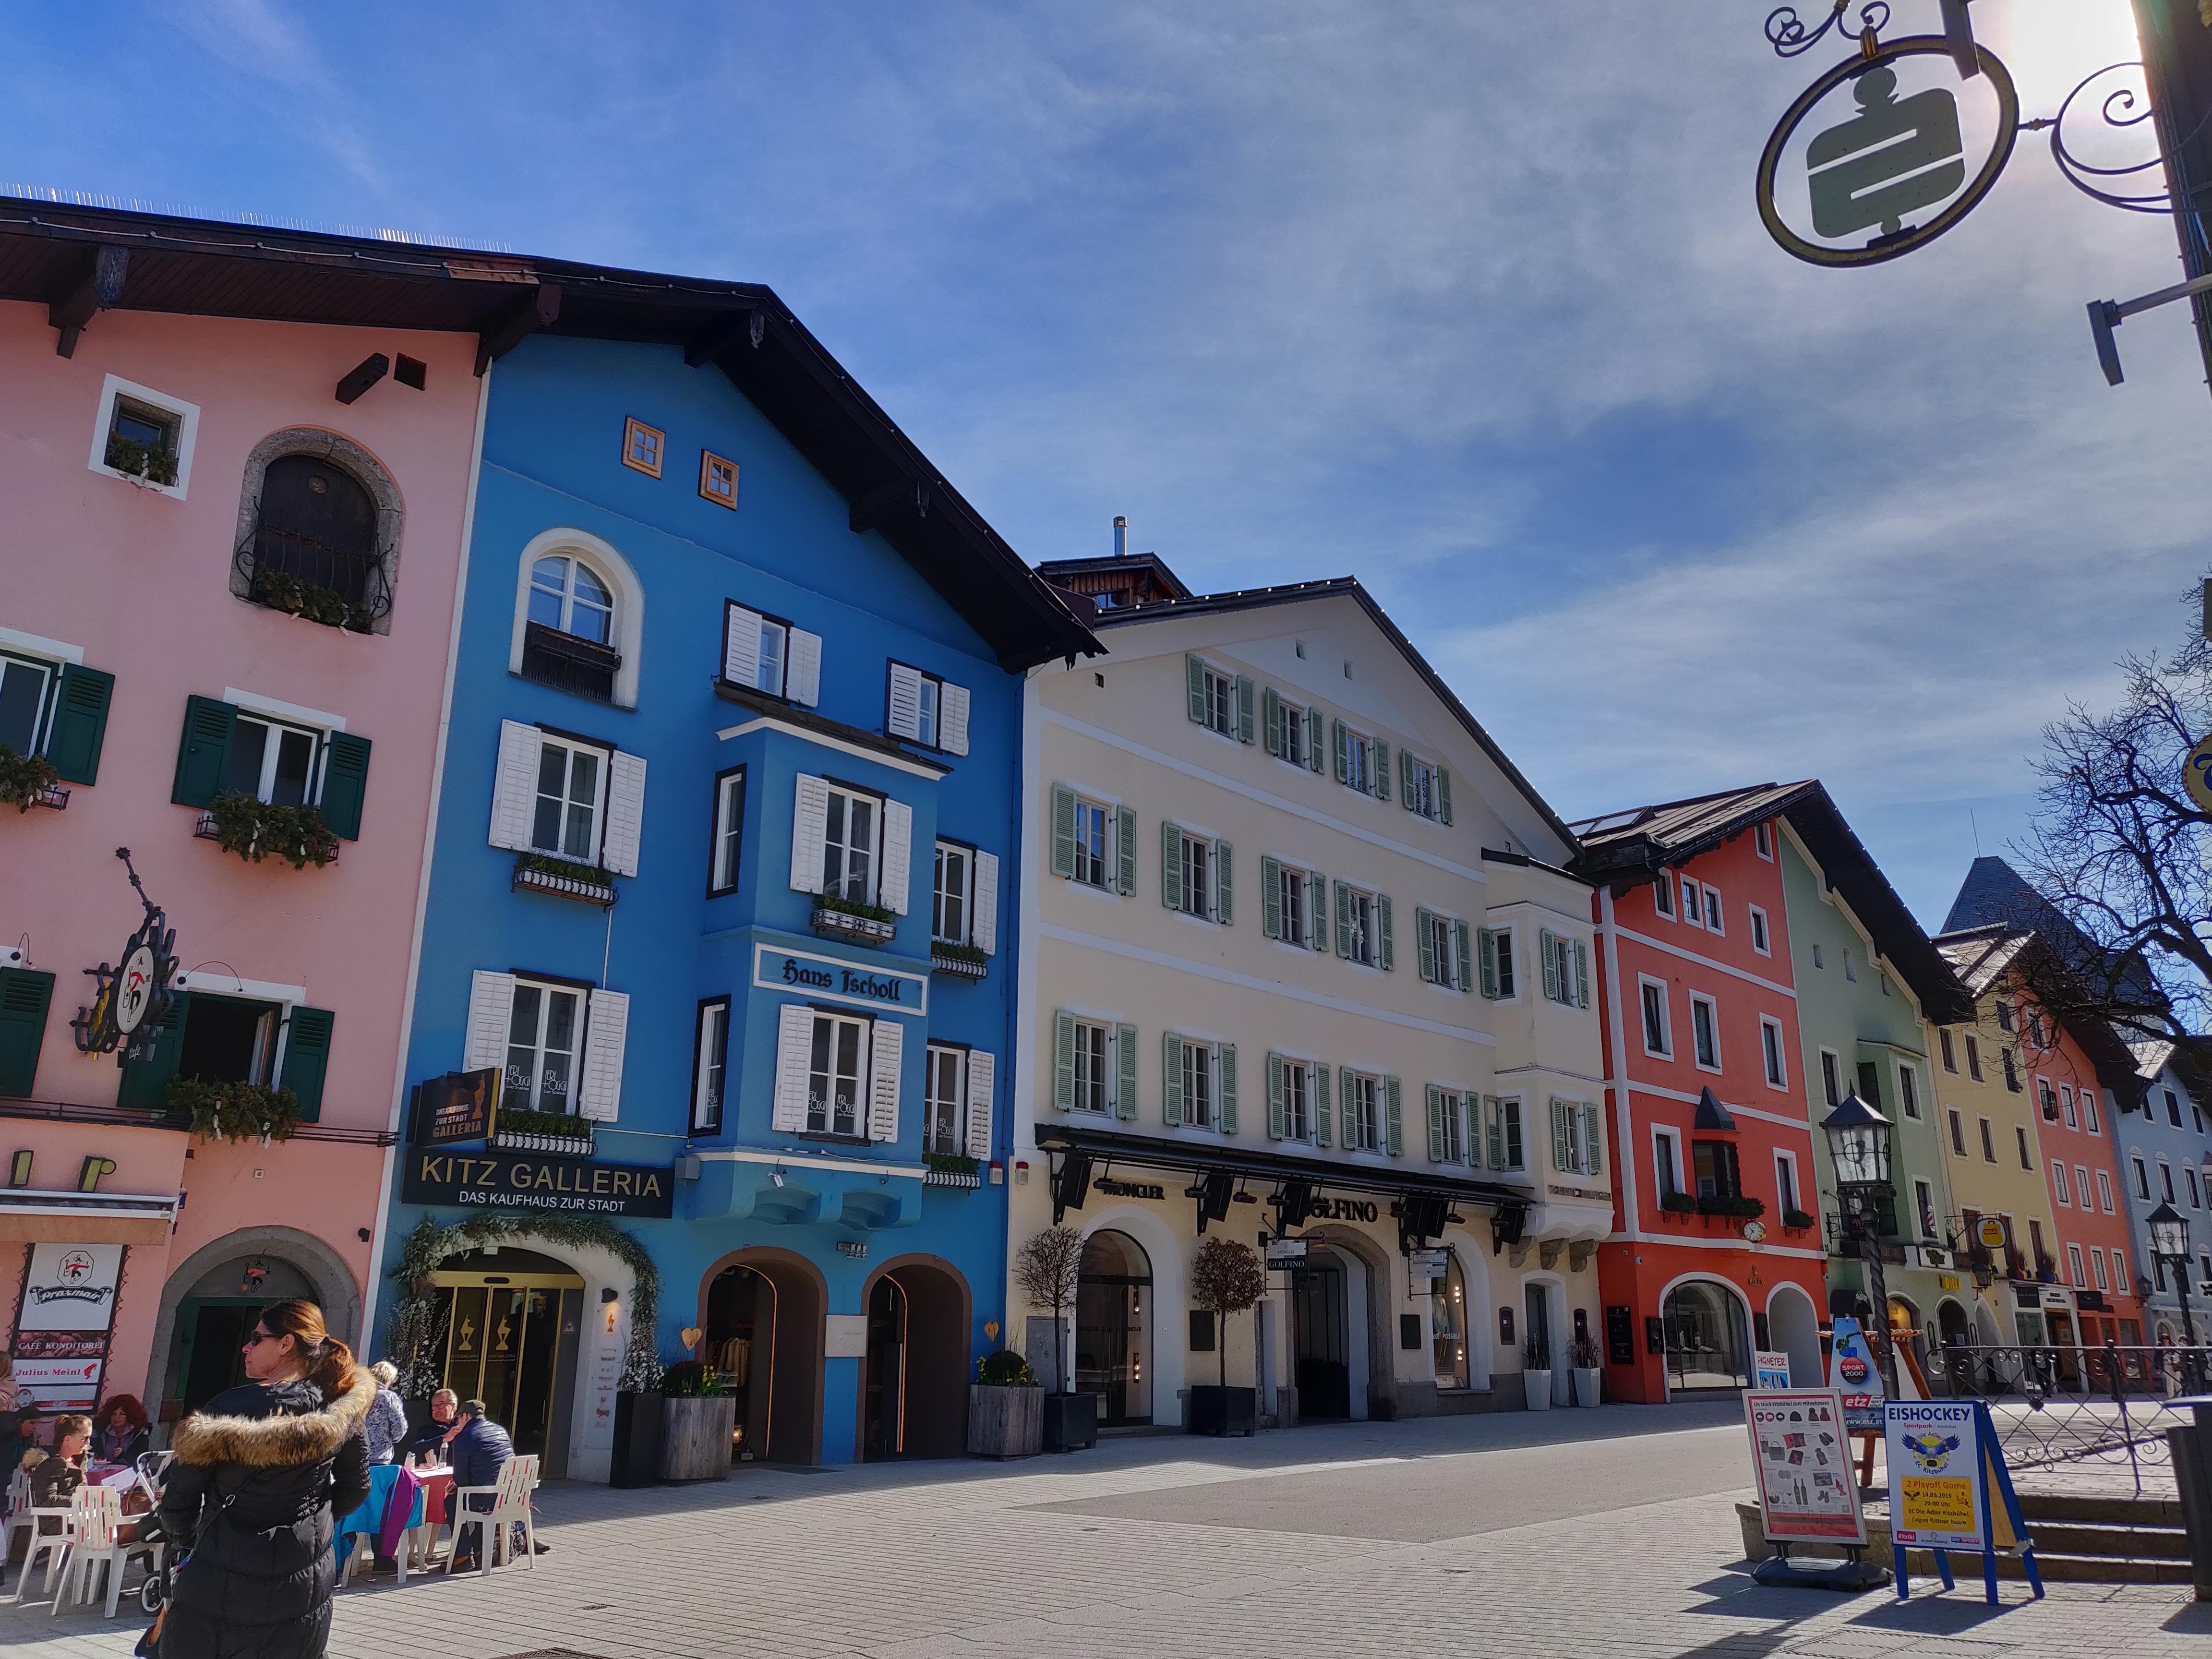 Kitzbühel Oostenrijk TravelRebel